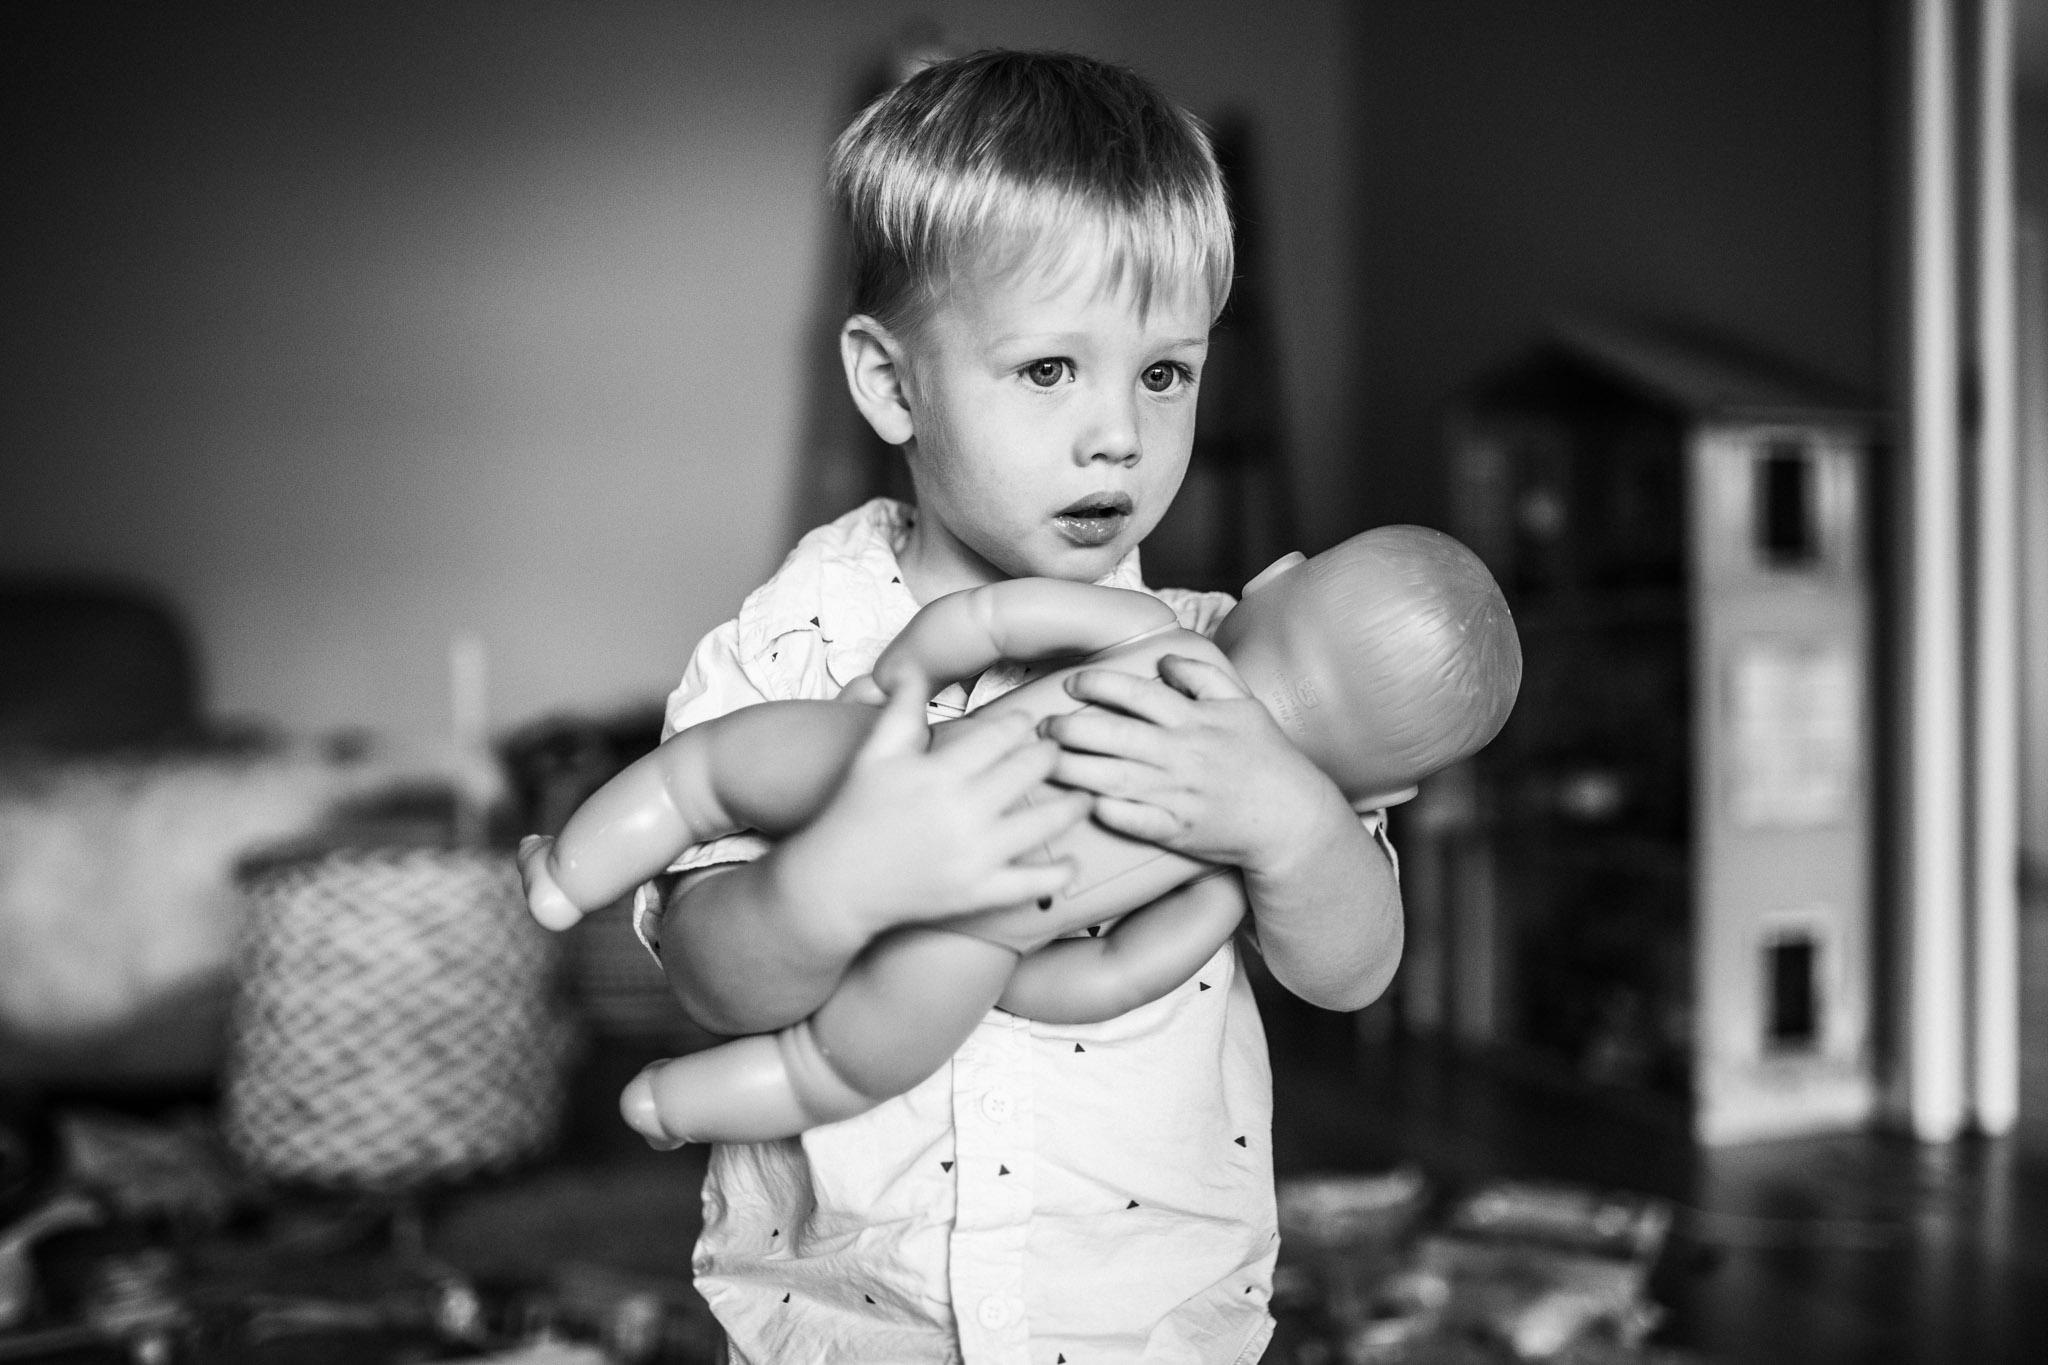 little-boy-nursing-baby-doll-in-playroom (1 of 1).jpg